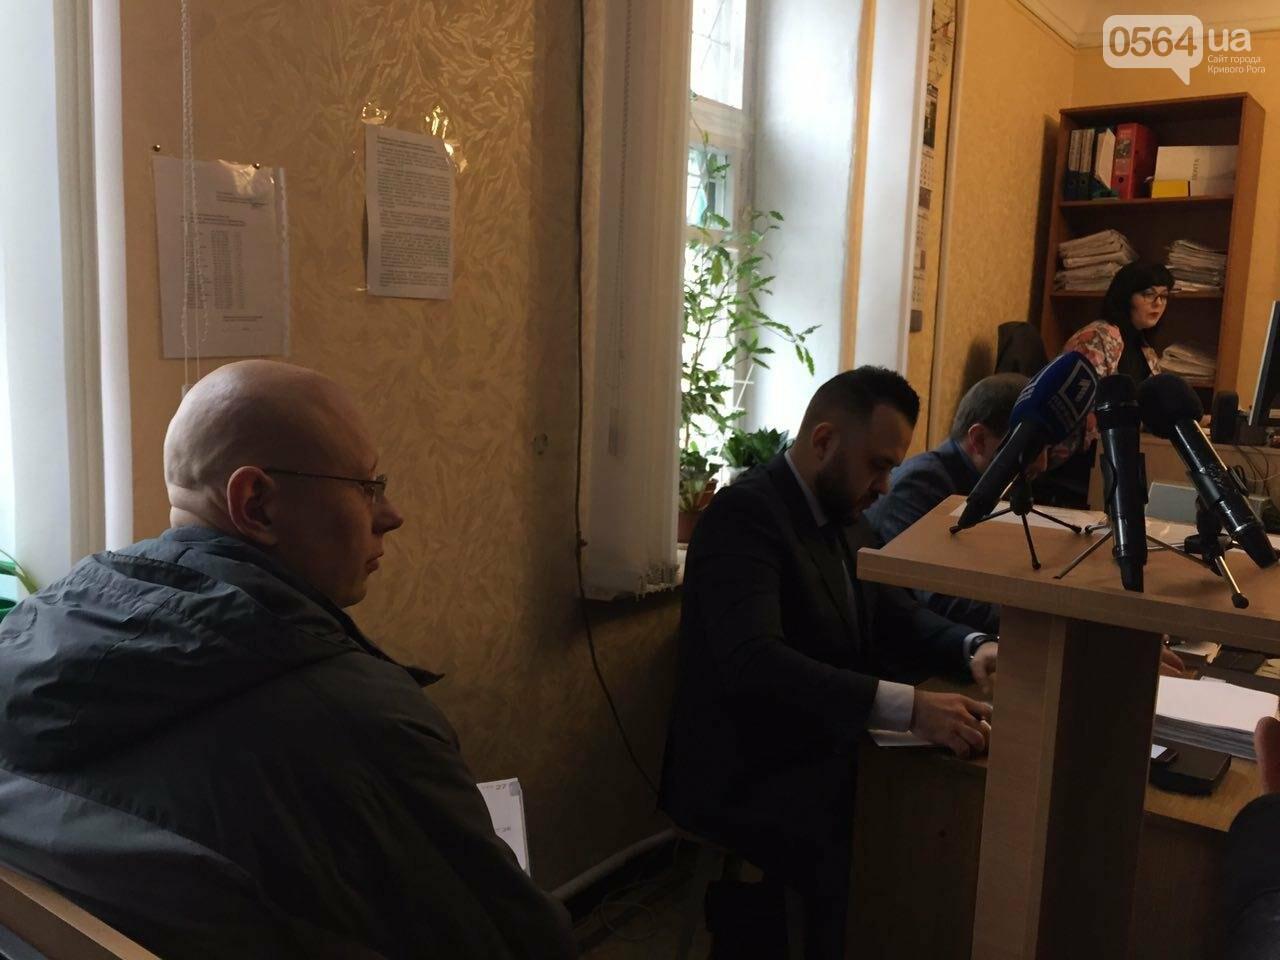 Криворожских журналистов в суде  допрашивают по делу Вячеслава Волка (ФОТО), фото-3